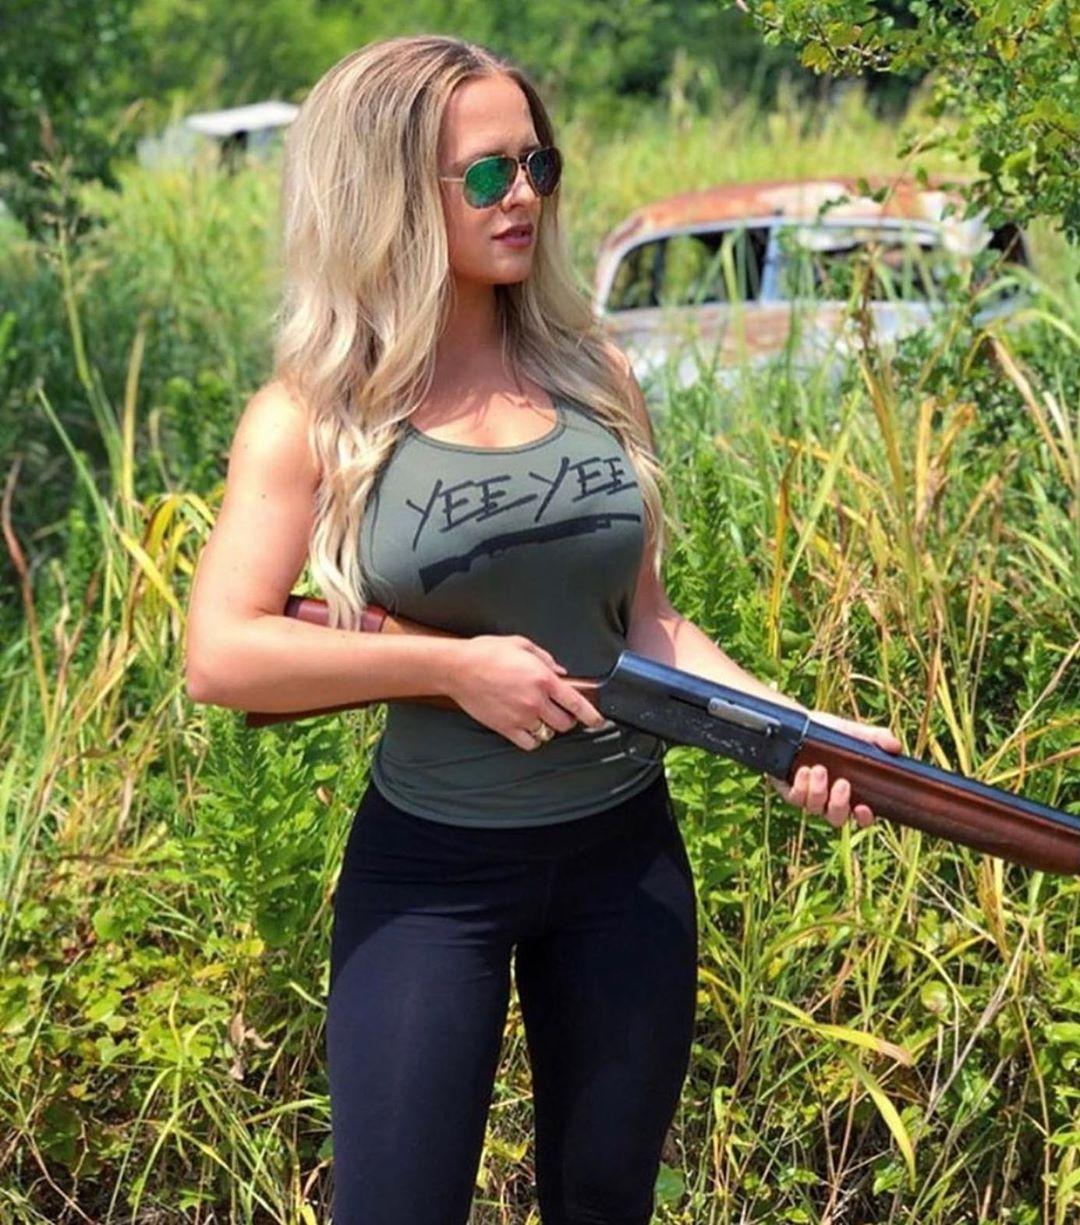 Hot girls hunting 35 Pics Of Hot Chicks Posing With Fresh Kills Wow Gallery